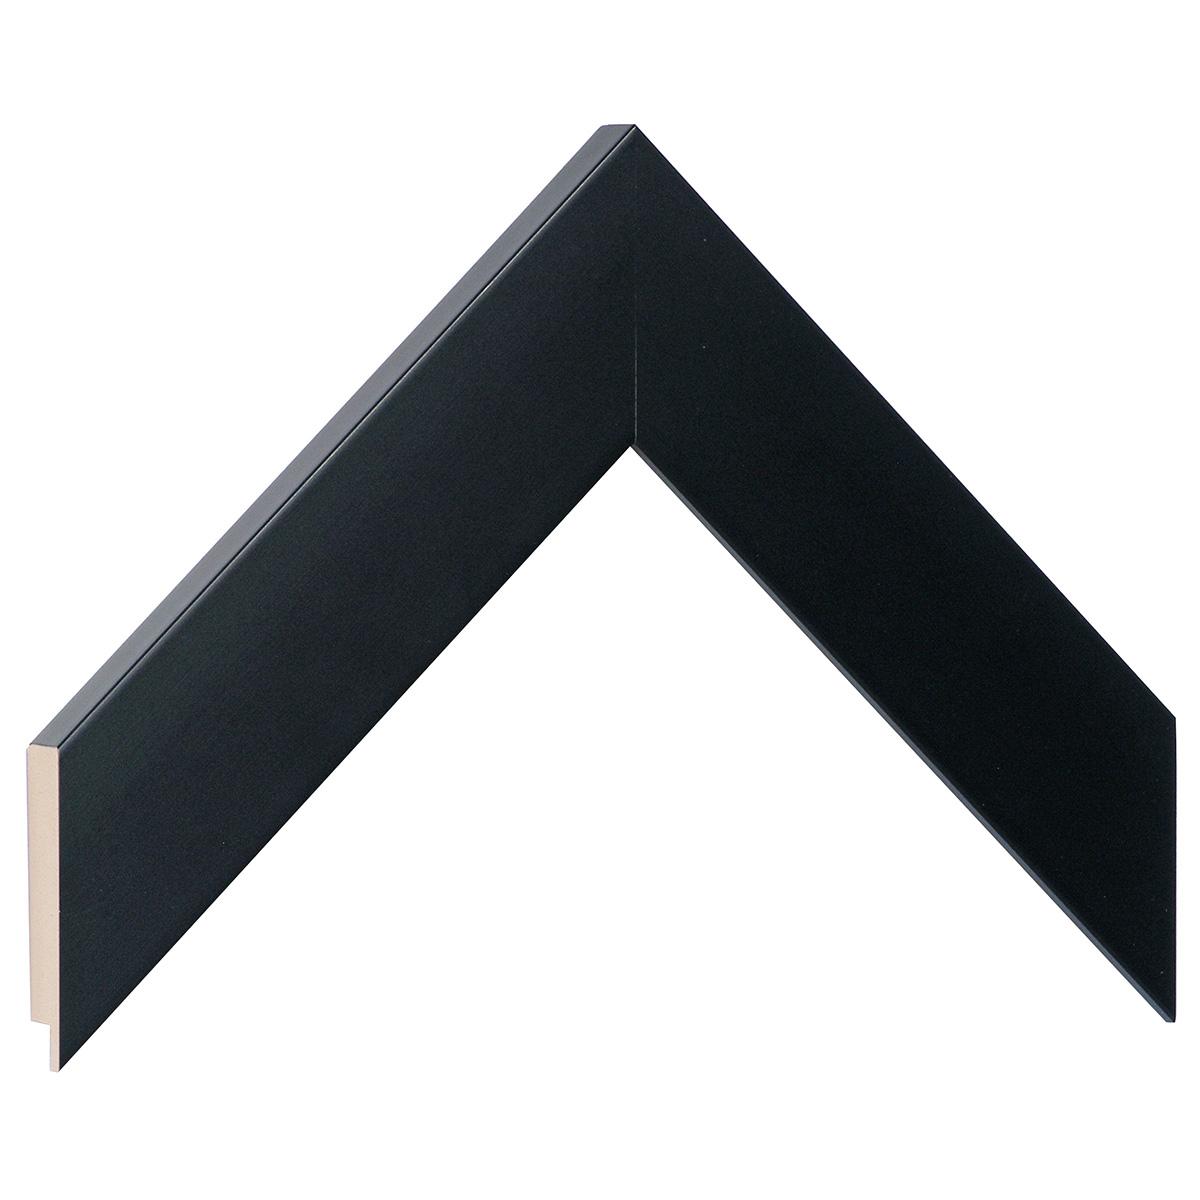 Moulding ayous, width 40mm height 16 - matt black